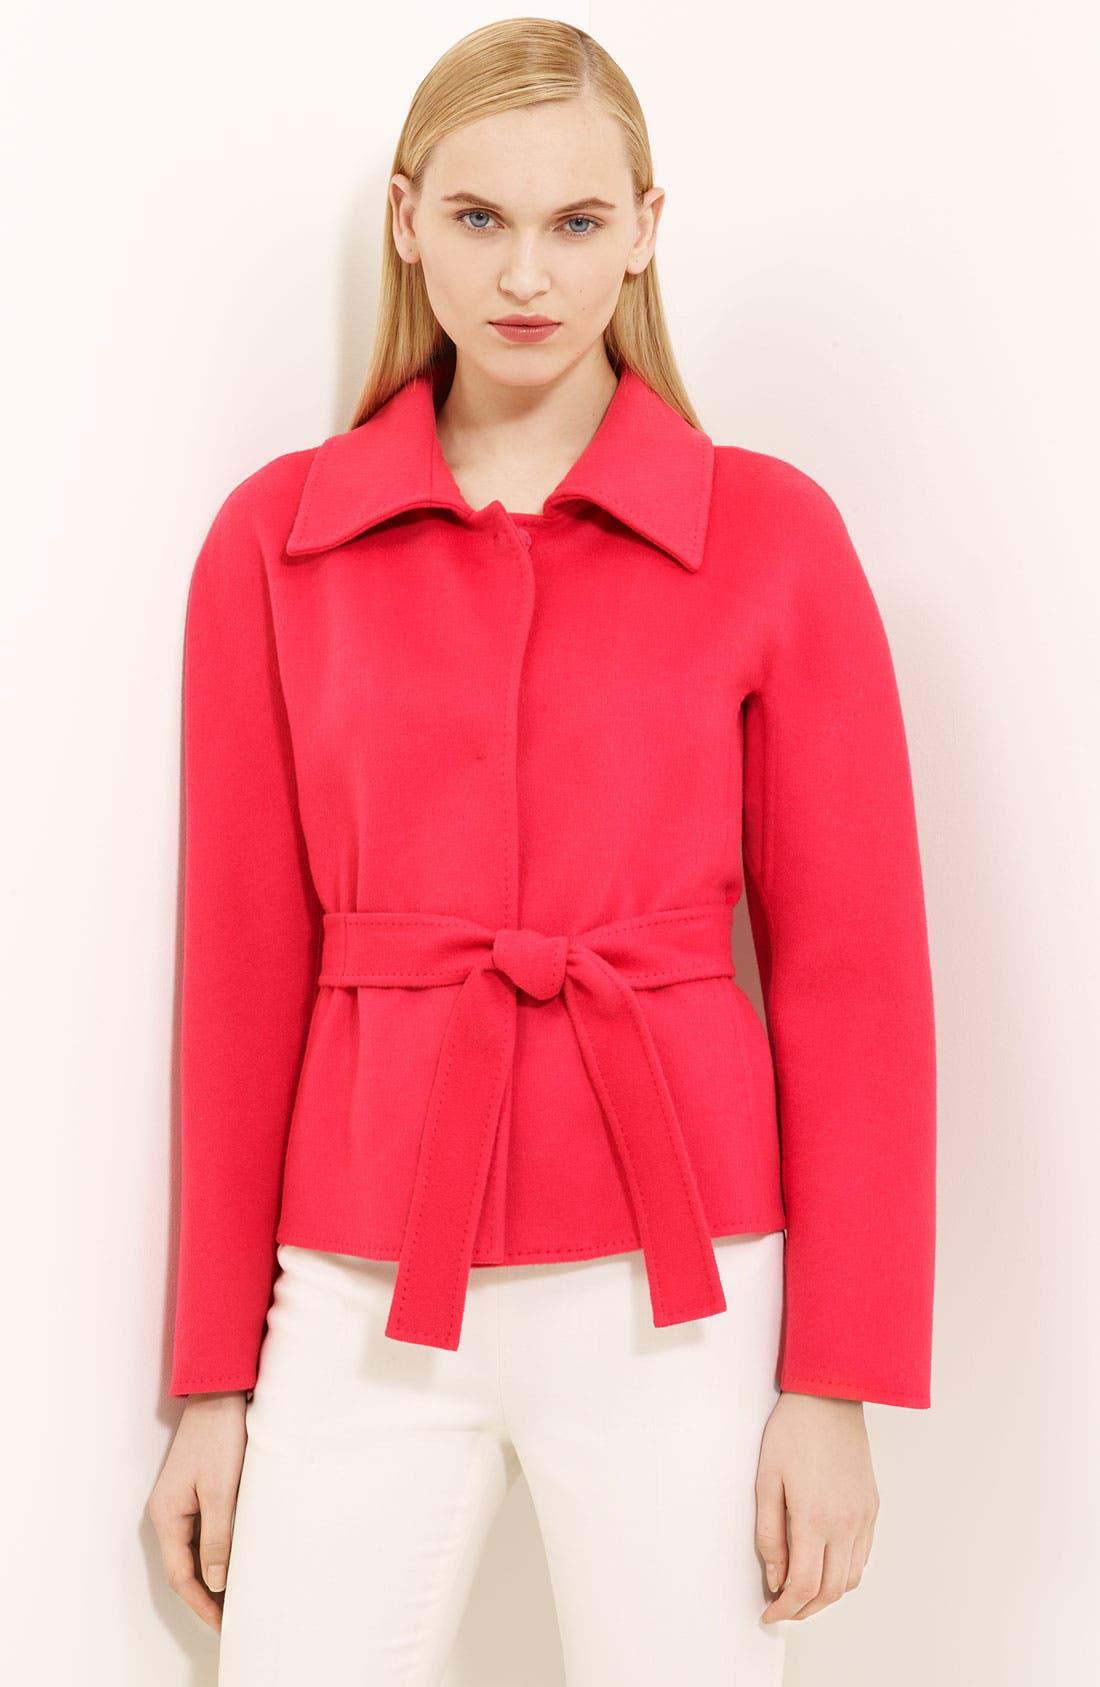 Main Image - Max Mara 'Sandra' Belted Jacket